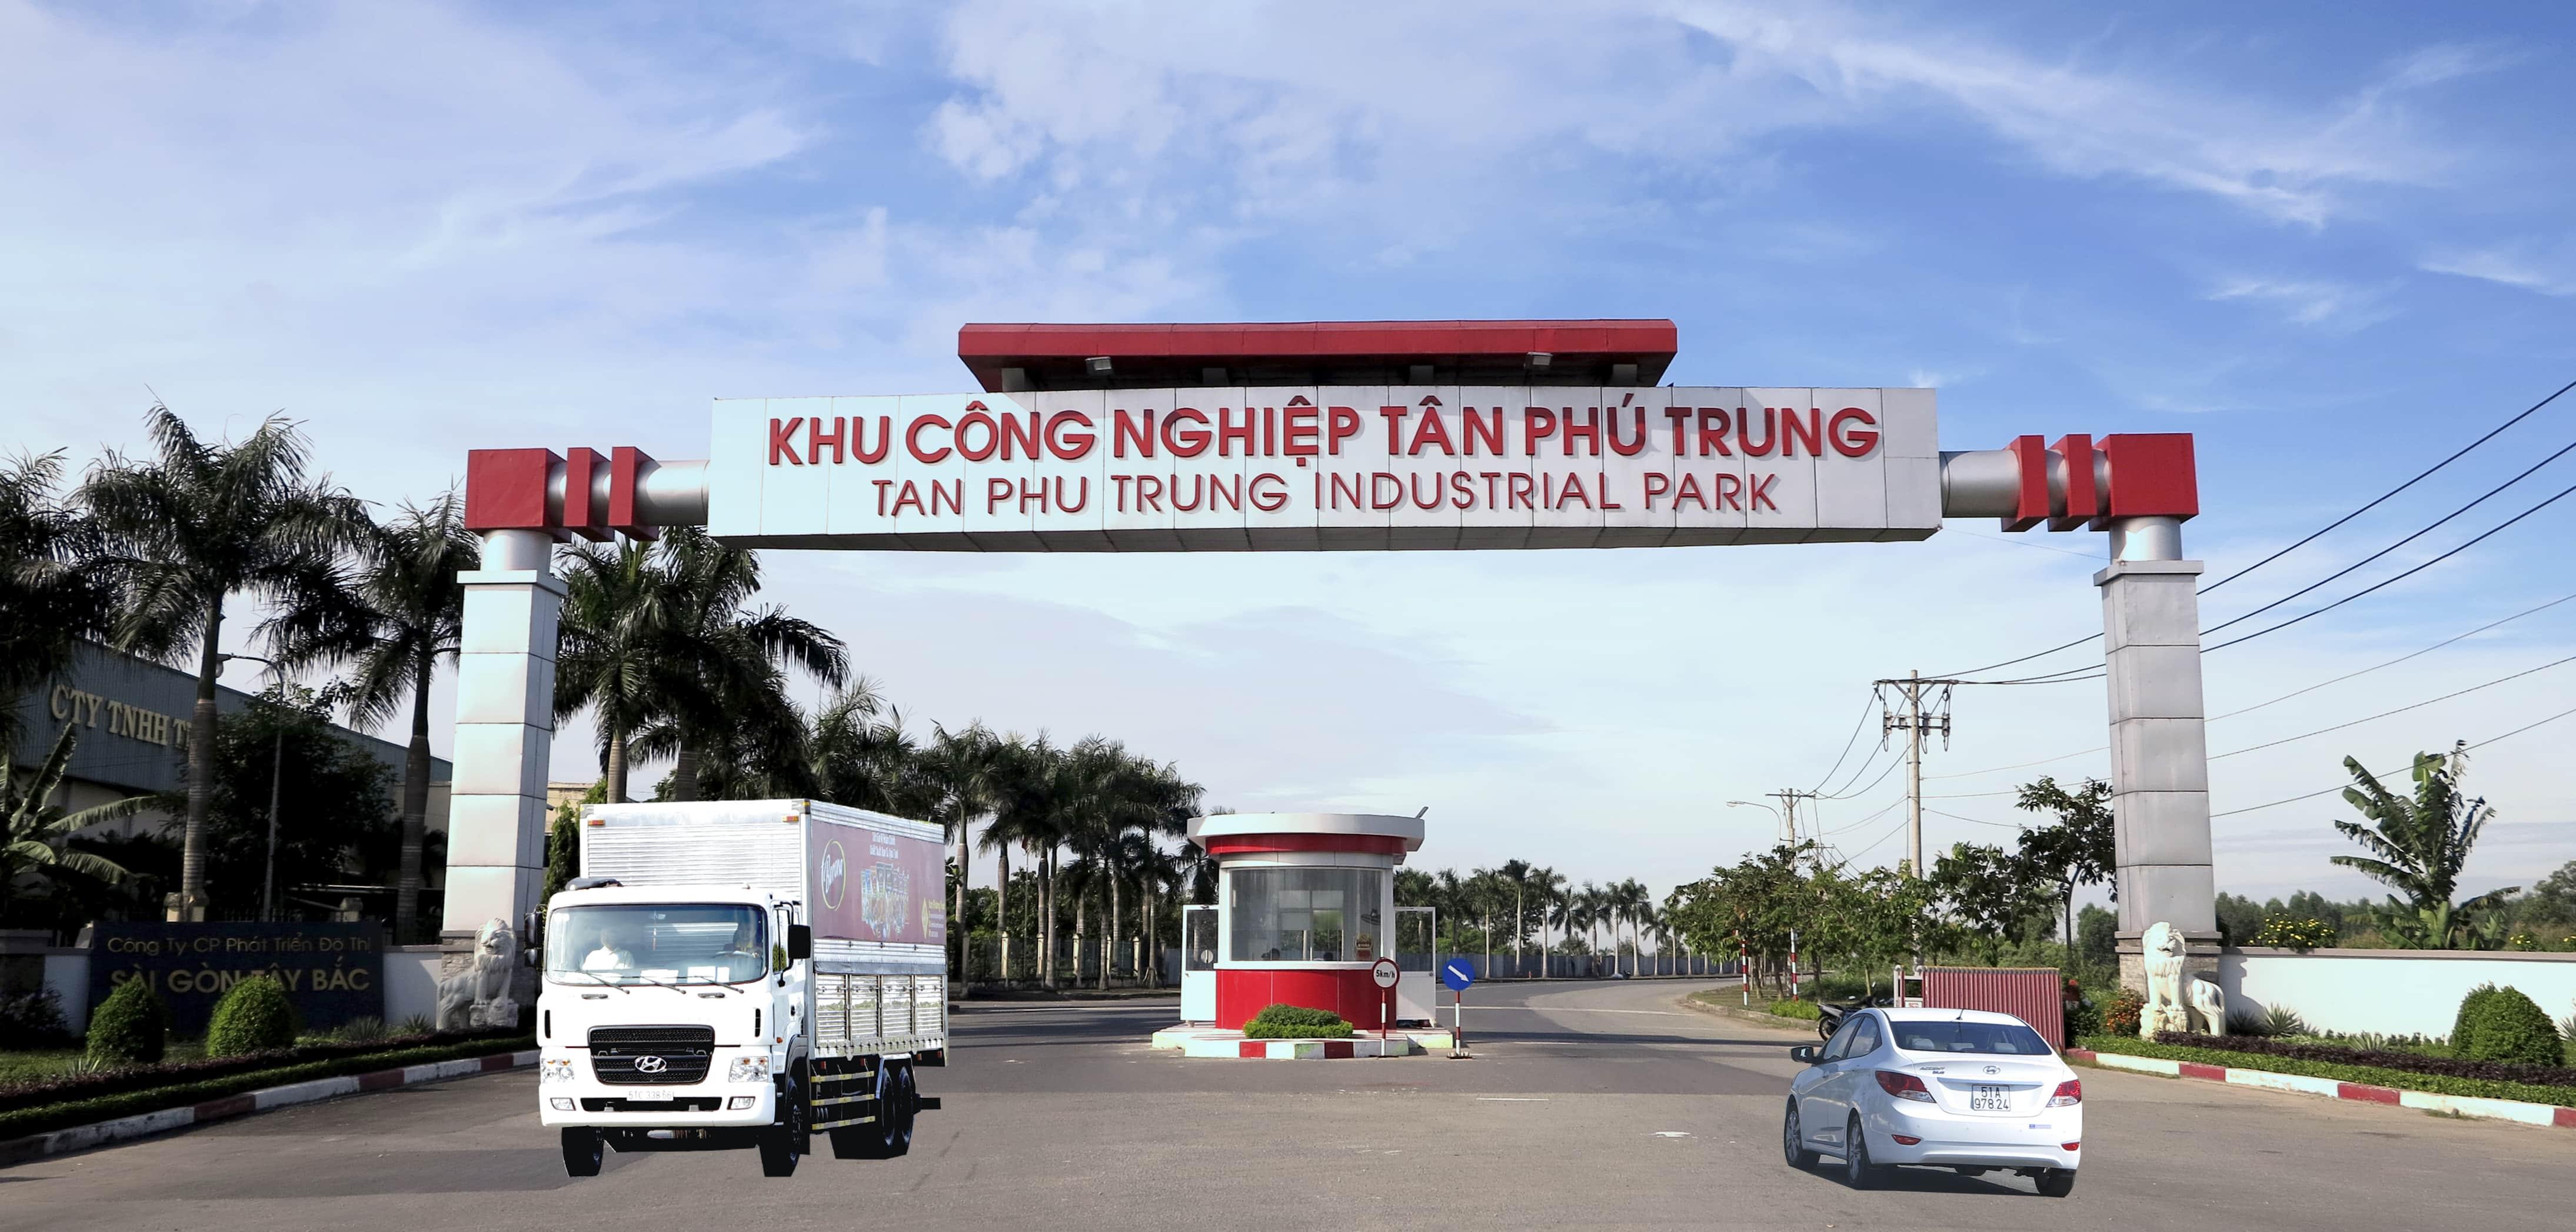 4-ly-do-bat-dong-san-cong-nghiep-viet-nam-tang-nhiet